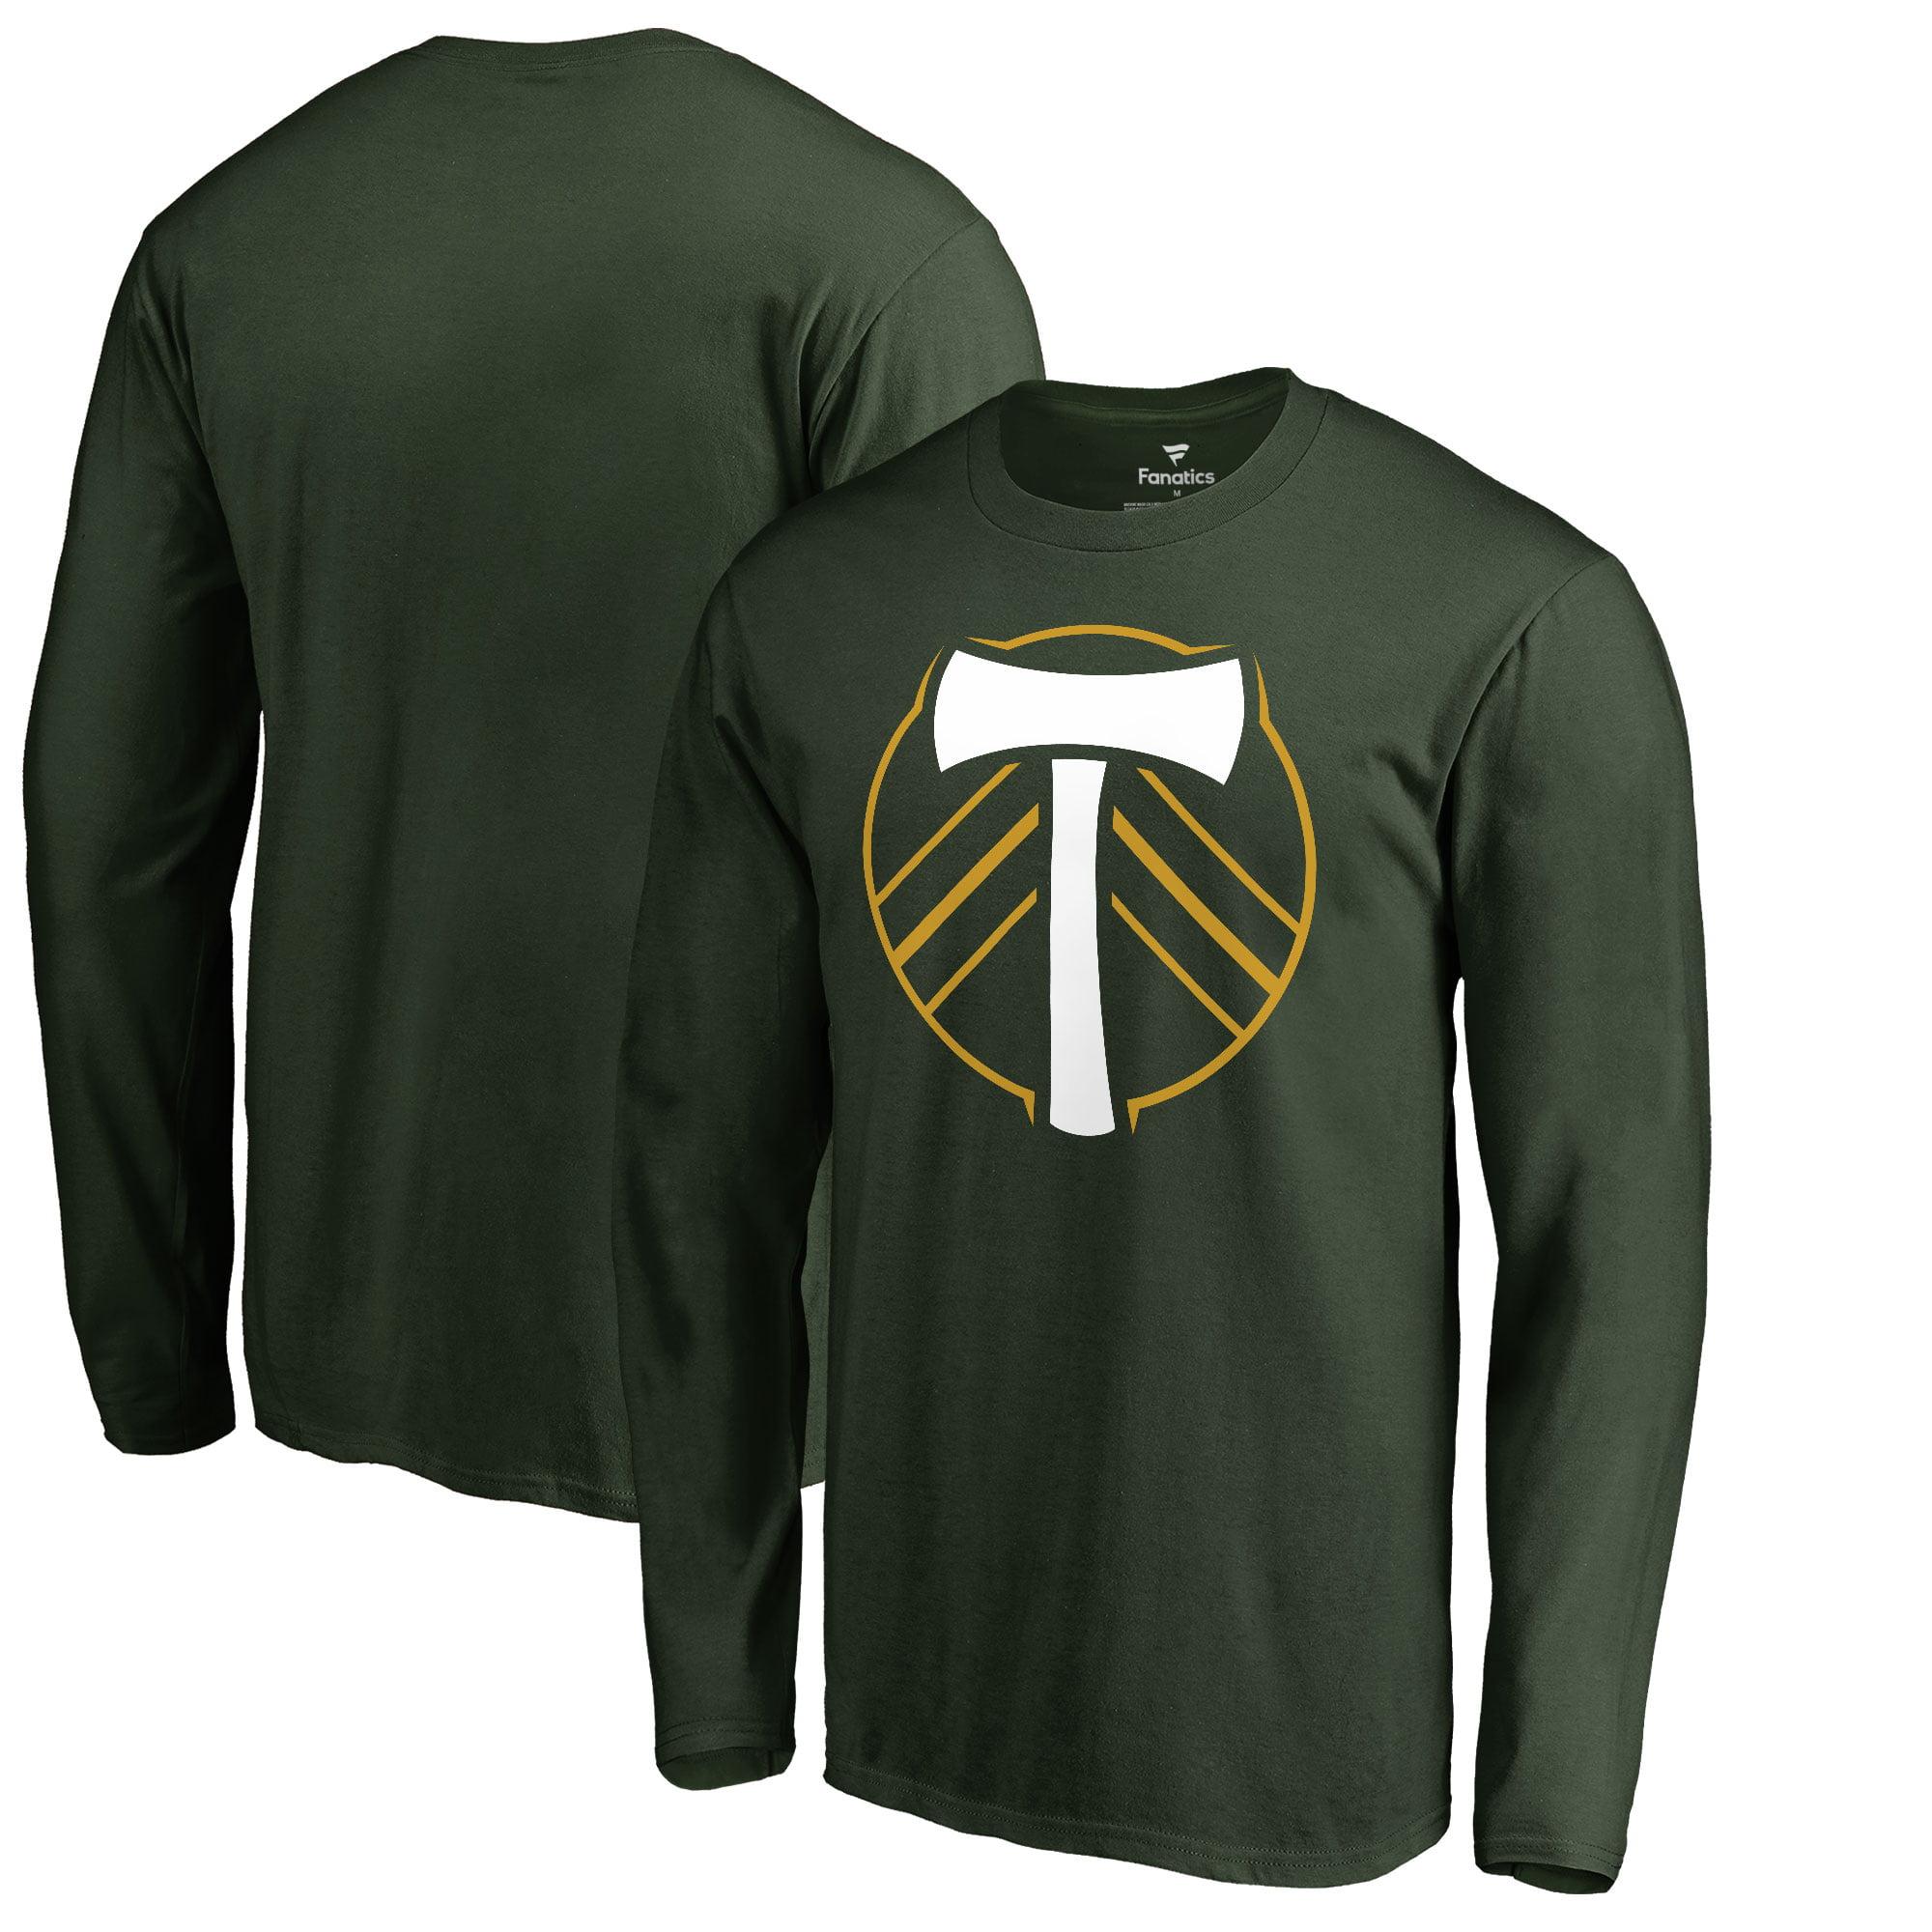 Portland Timbers Fanatics Branded Primary Logo Long Sleeve T-Shirt - Green